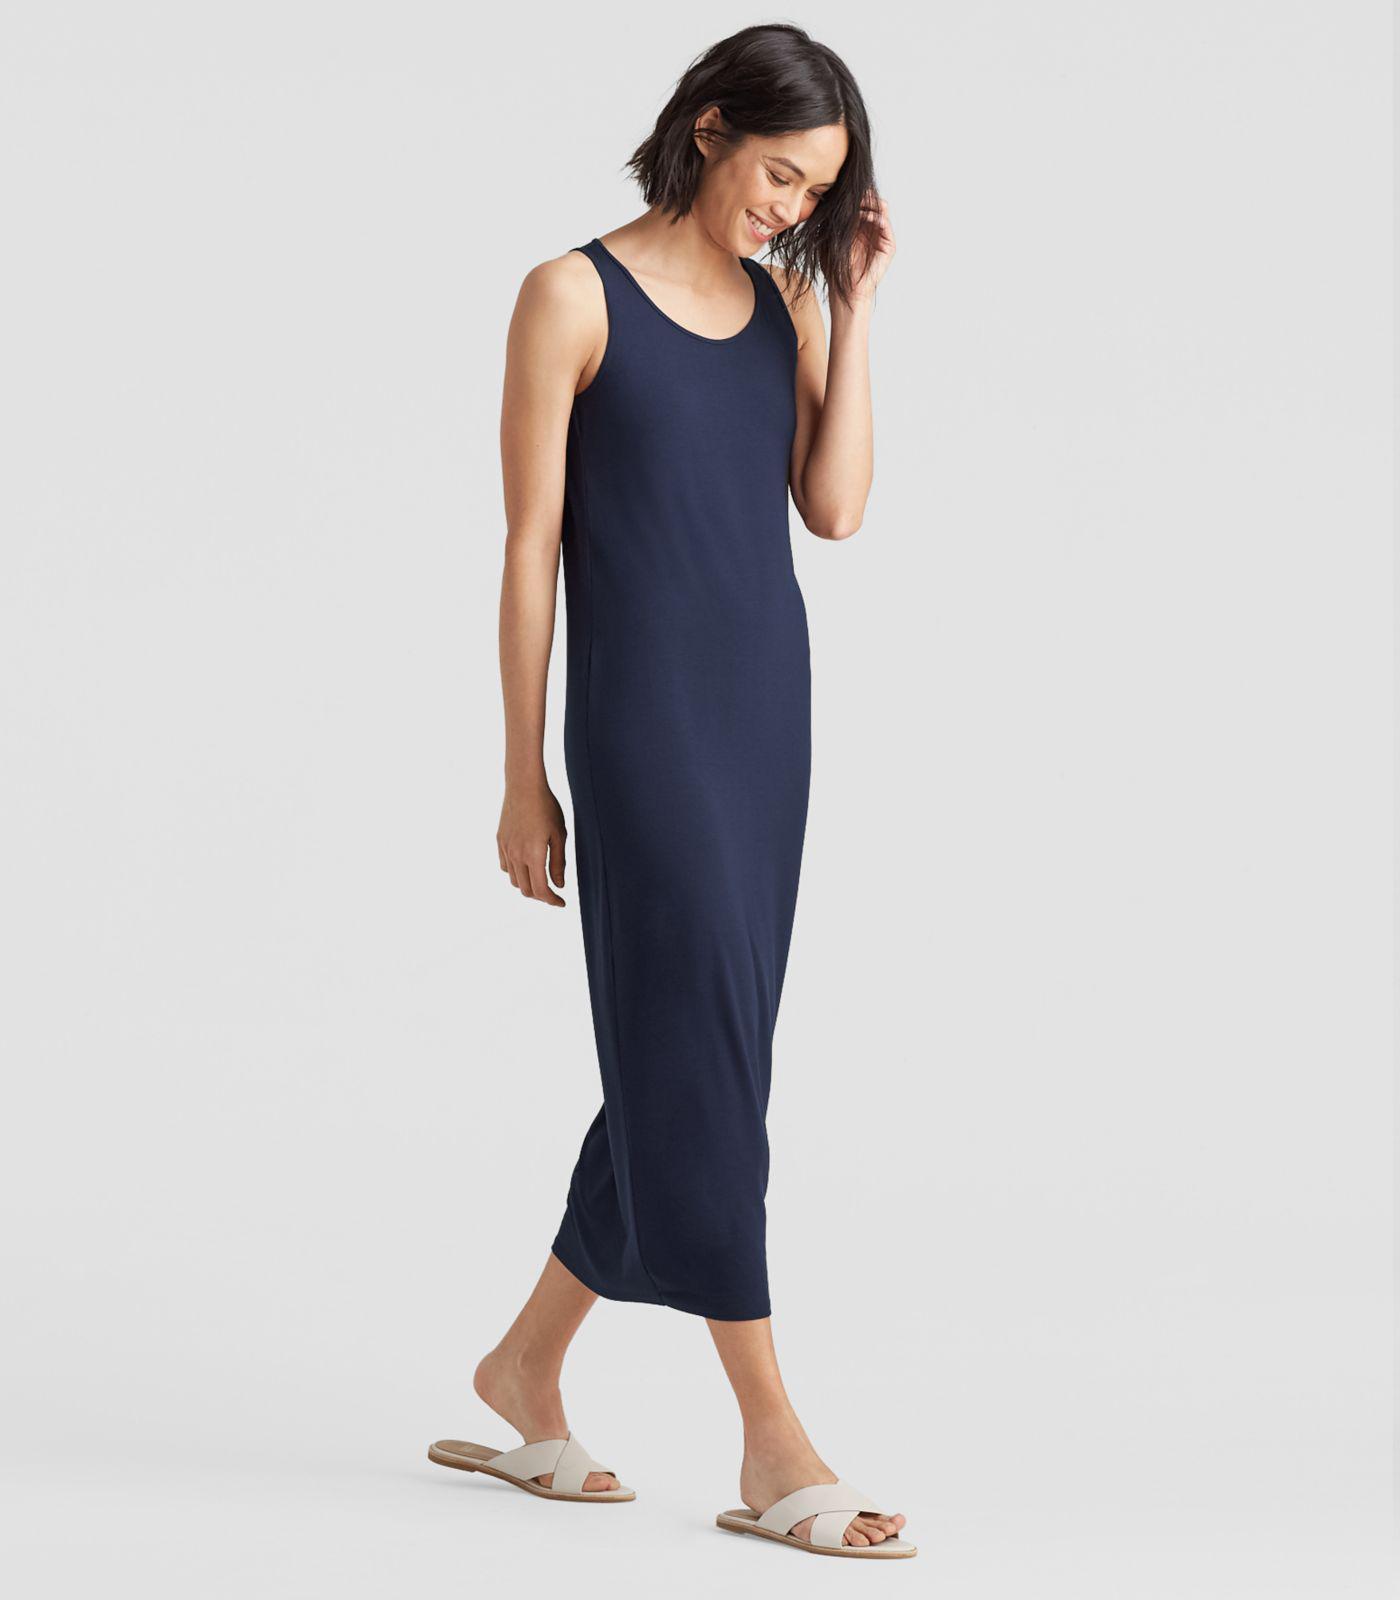 8612d867f3a4 Lyst - Eileen Fisher System Viscose Jersey Tank Dress in Blue